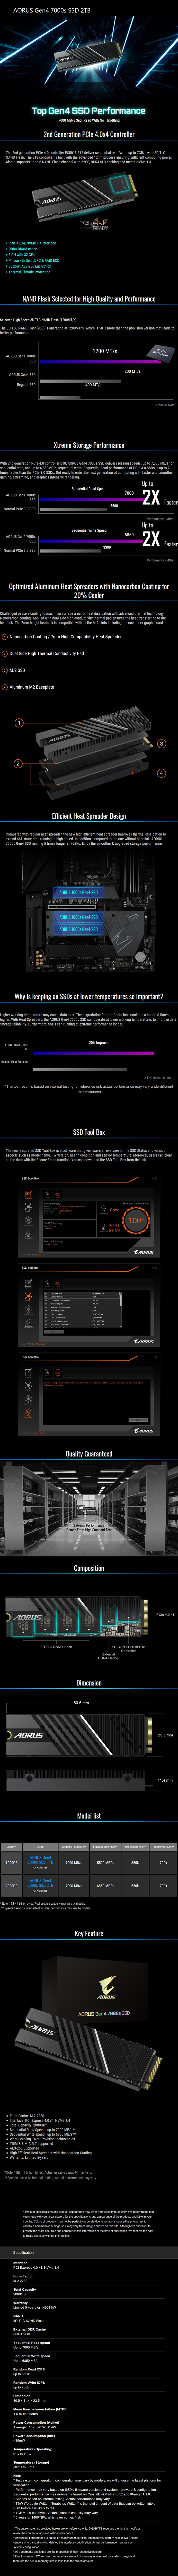 Gigabyte AORUS Gen4 7000s 2TB PCIe 4.0 NVMe 1.4 M.2 (2280) SSD - GP-AG70S2TB - Desktop Overview 1